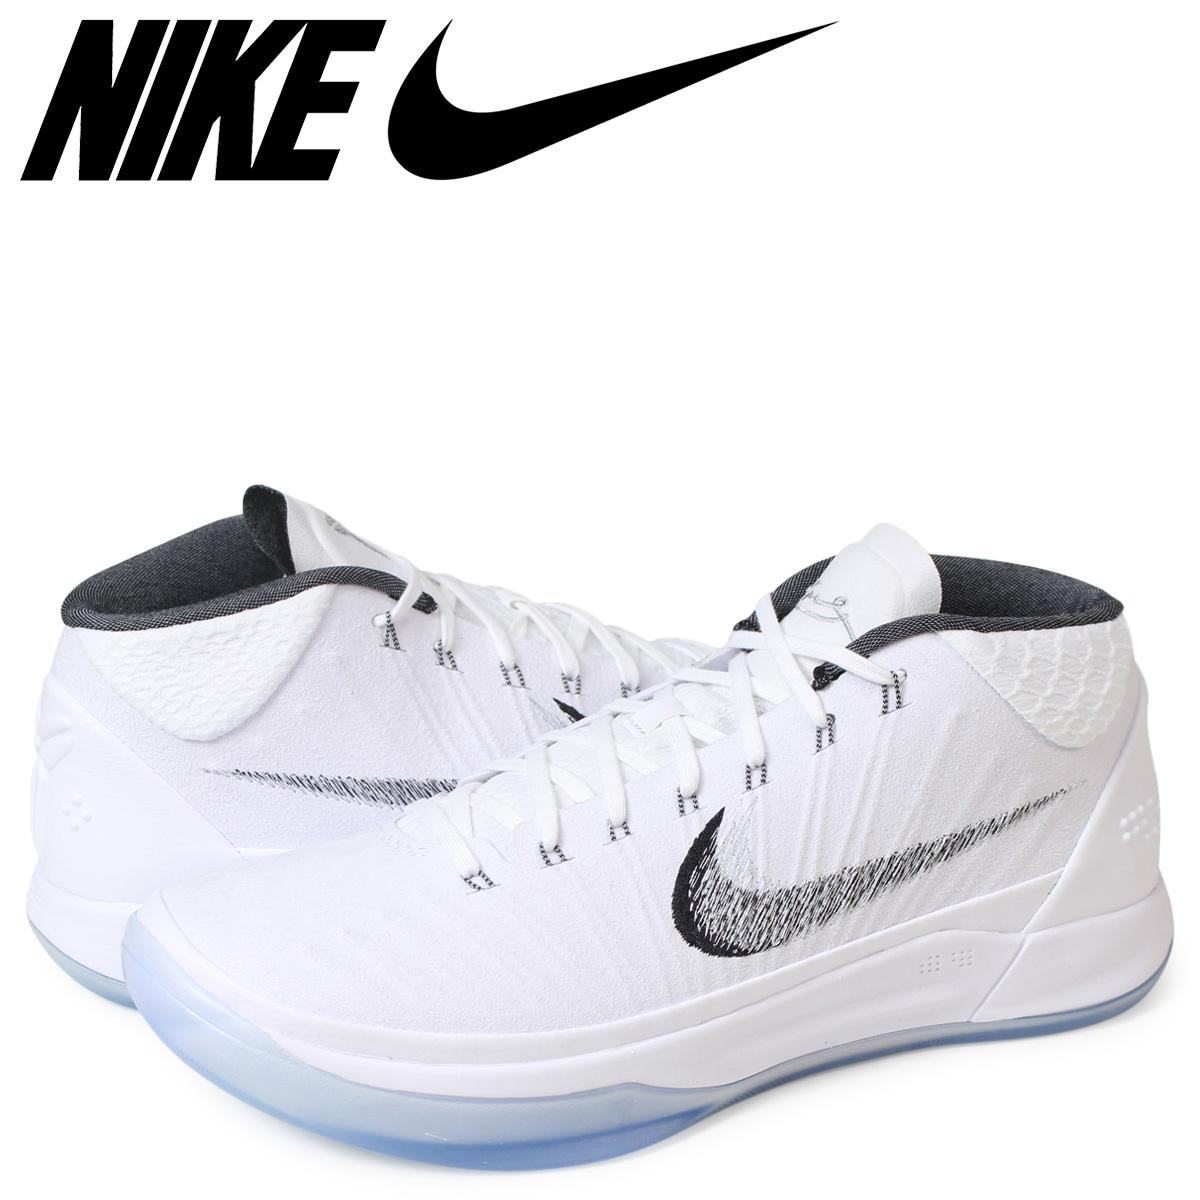 3ffc3fc6cc31 ALLSPORTS  NIKE KOBE AD EP Nike Corby sneakers men AO9050-100 white ...